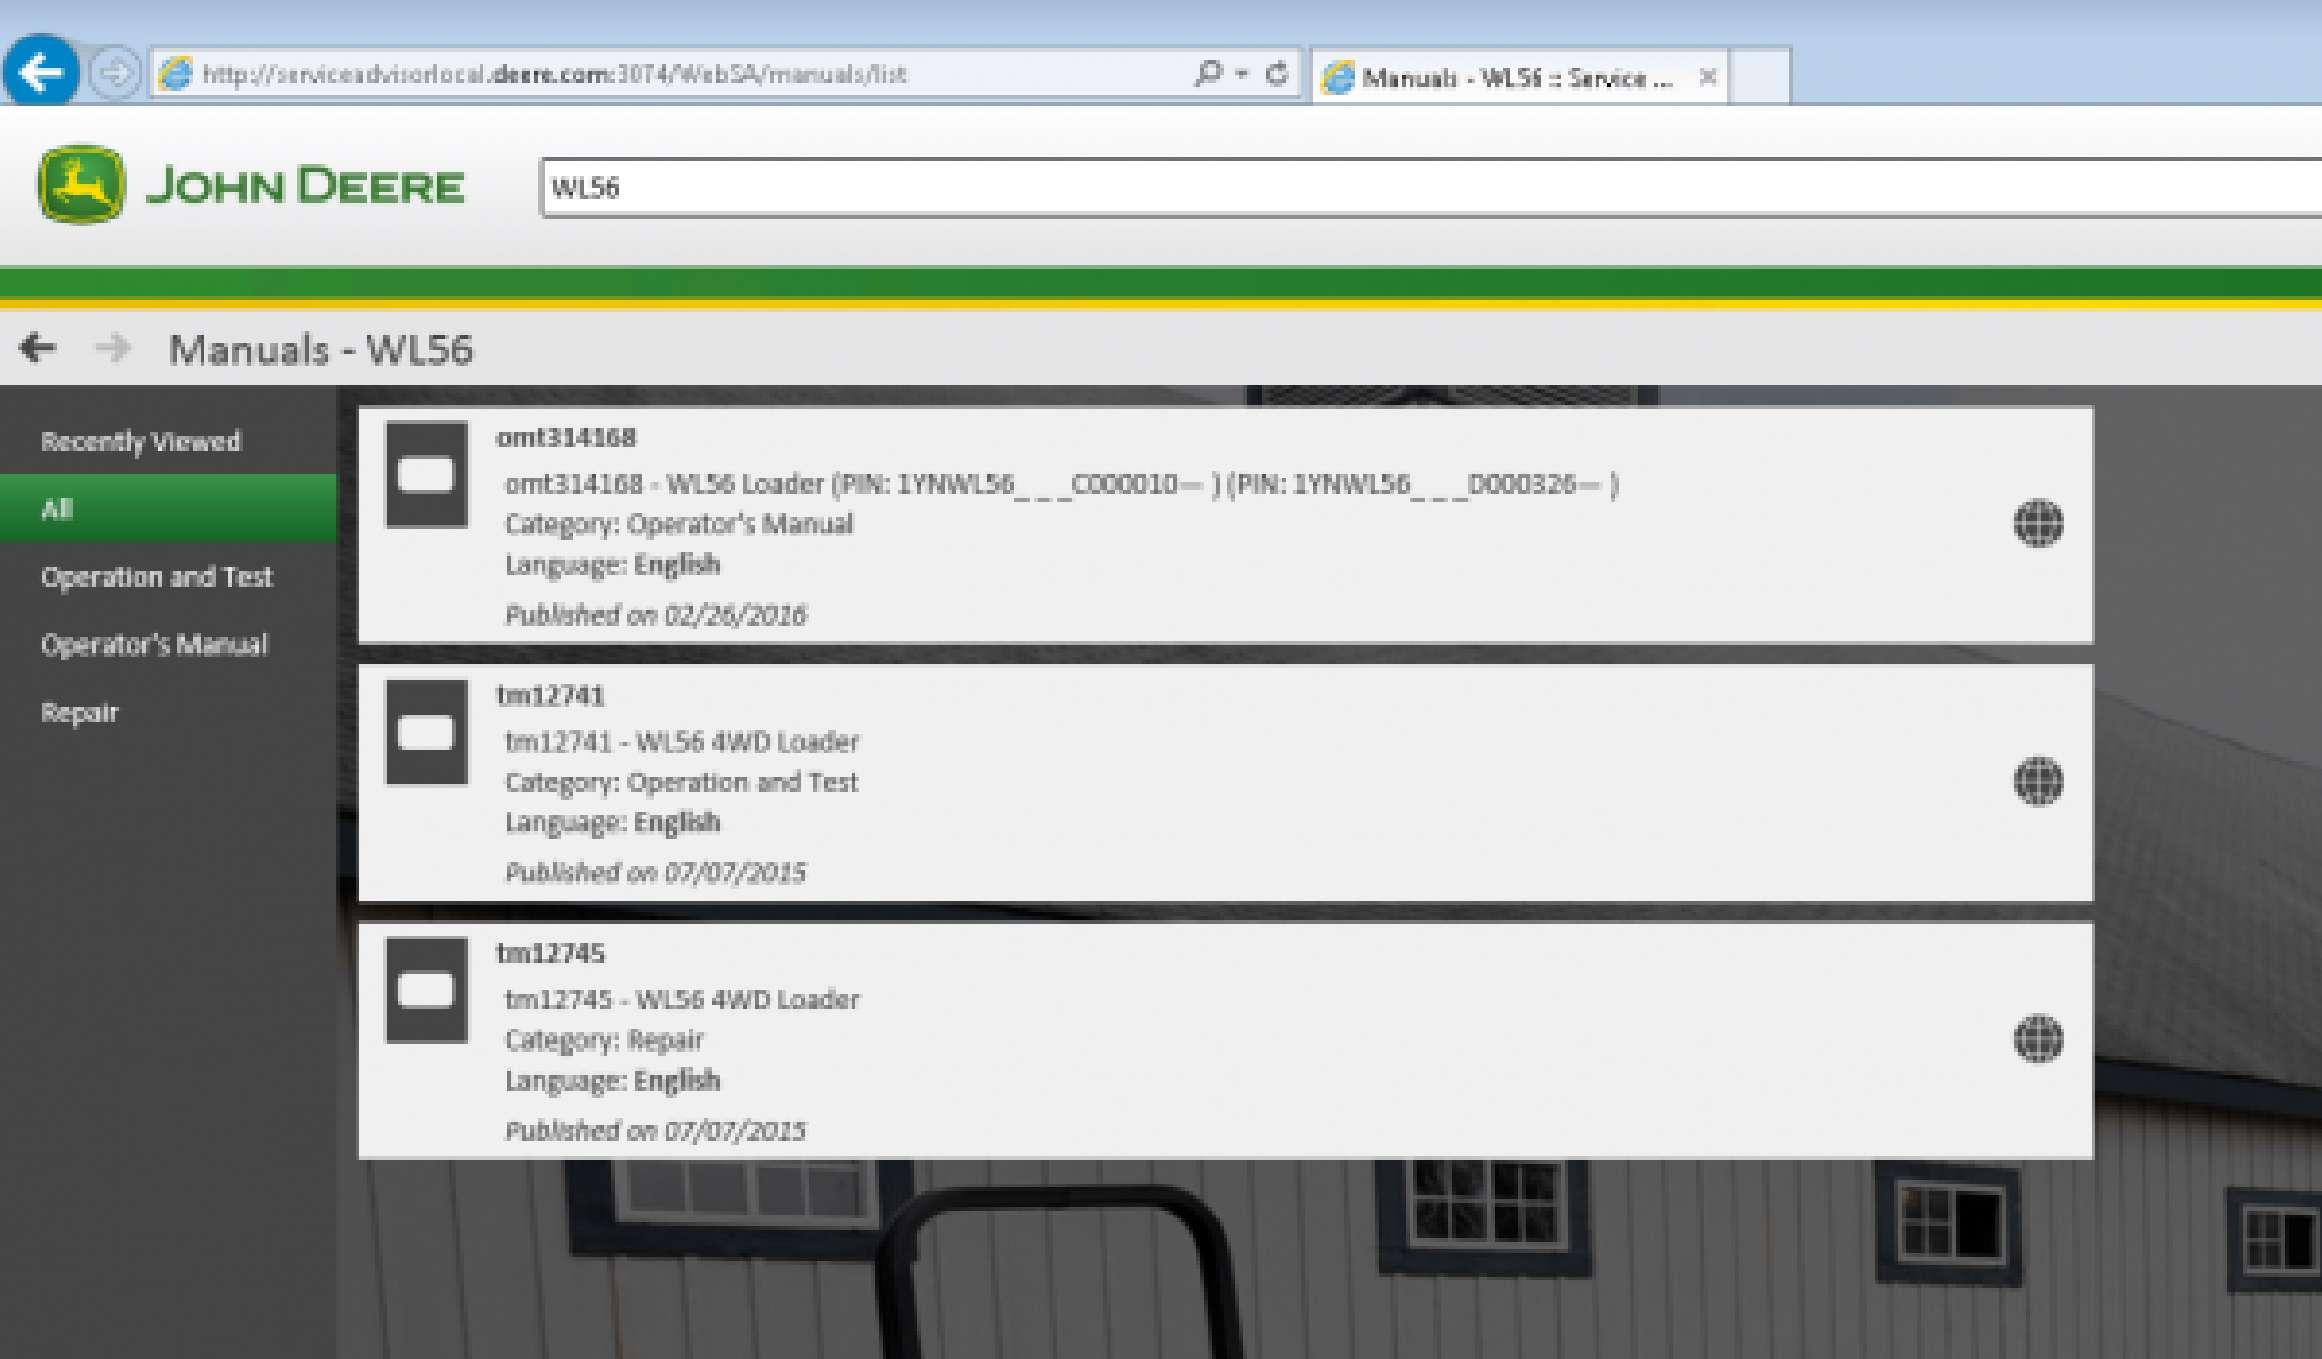 John Deere Service Advisor 5.3 2020 AG or CF (version for diagnosis) for 1 PC SS-01